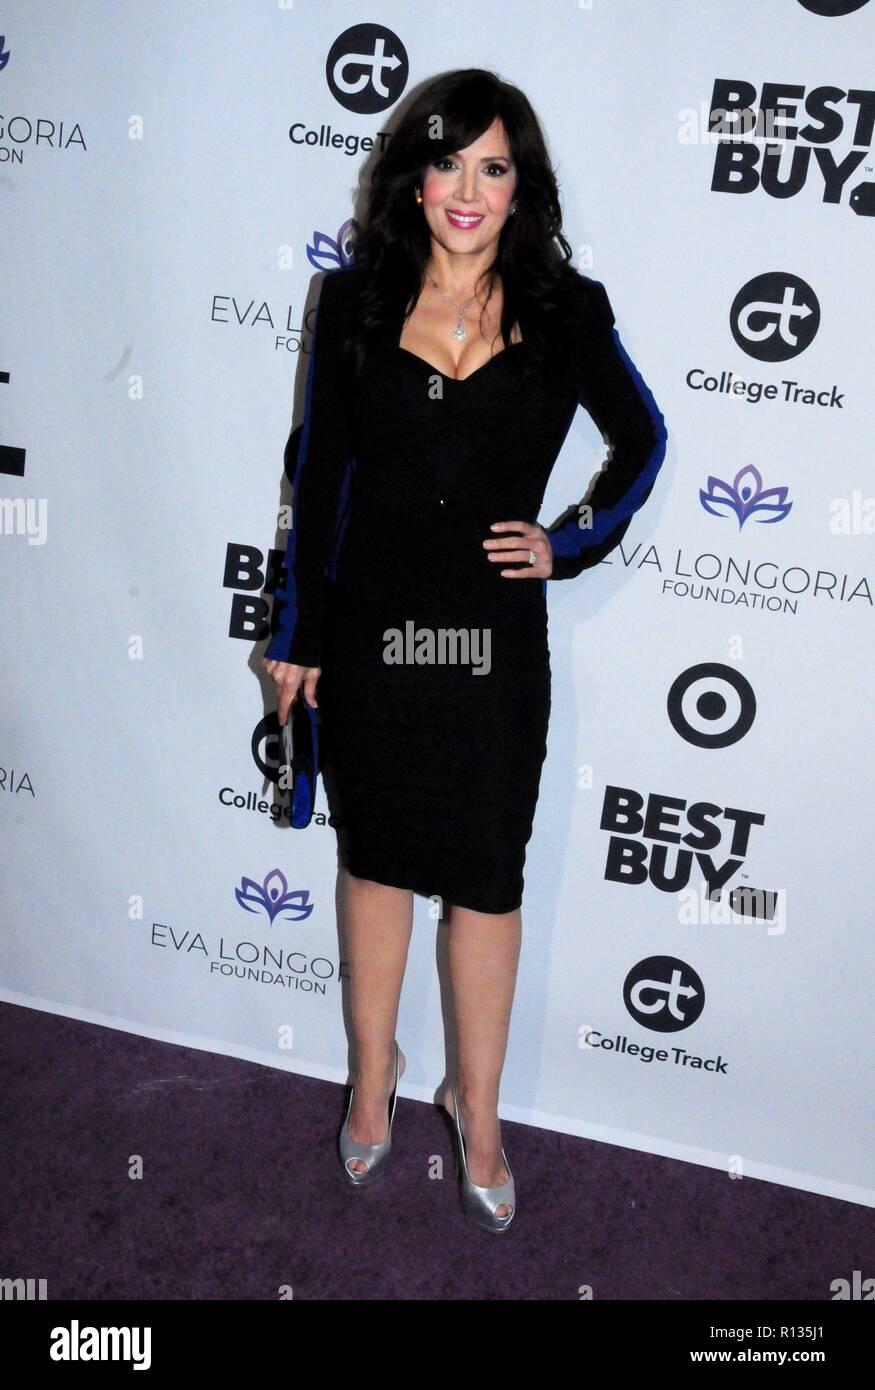 cbc2e2f122fb Los Angeles, California, USA. 8th November, 2018. Actress Maria Canals-